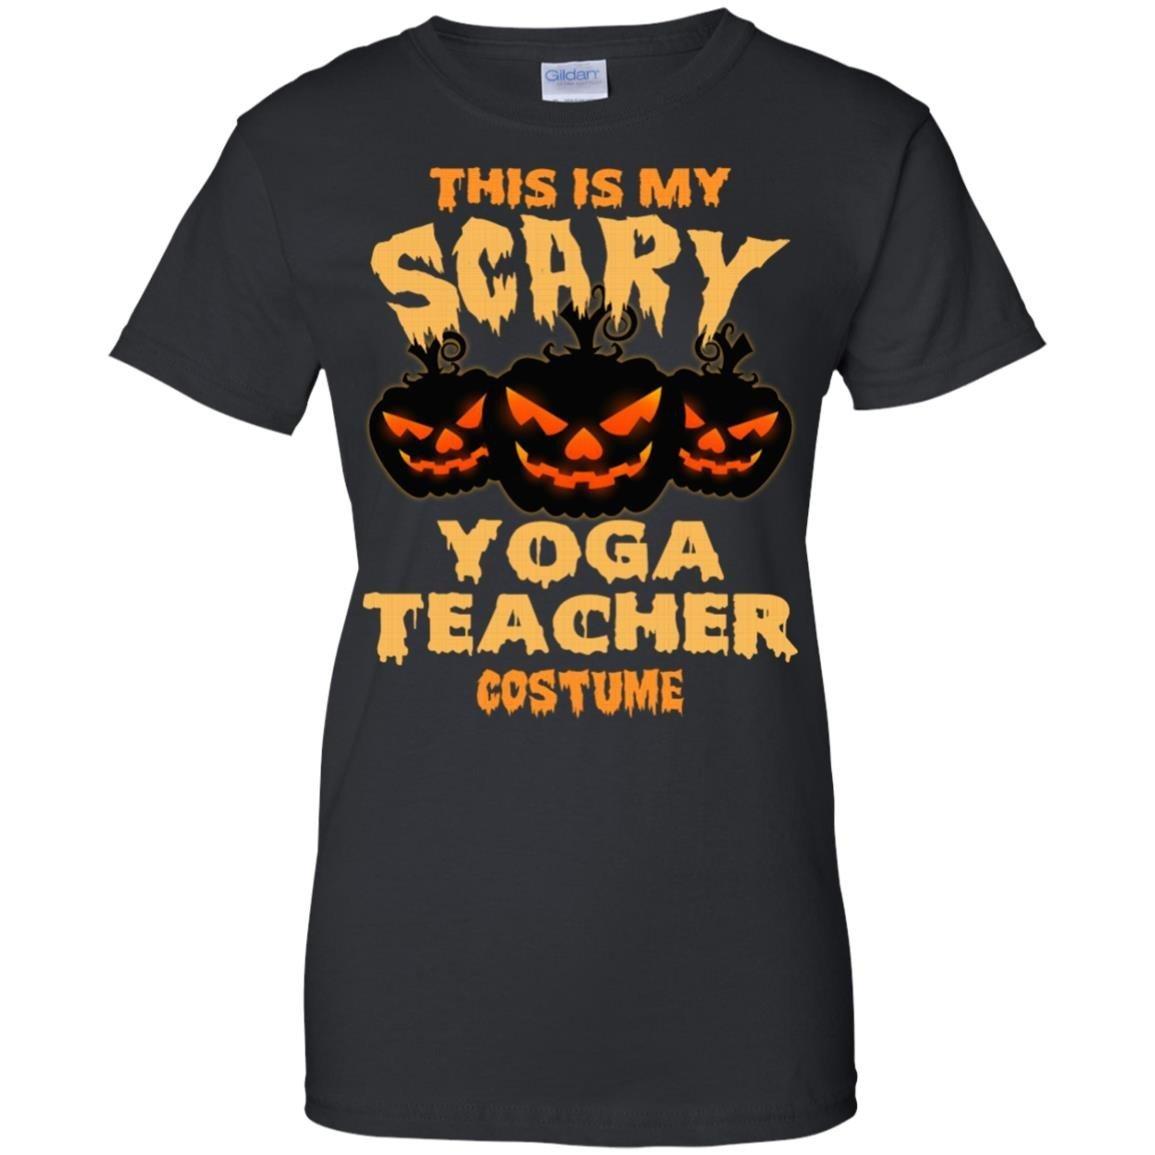 Yoga Teacher This Is My Yoga Teacher Costume T-Shirt Women